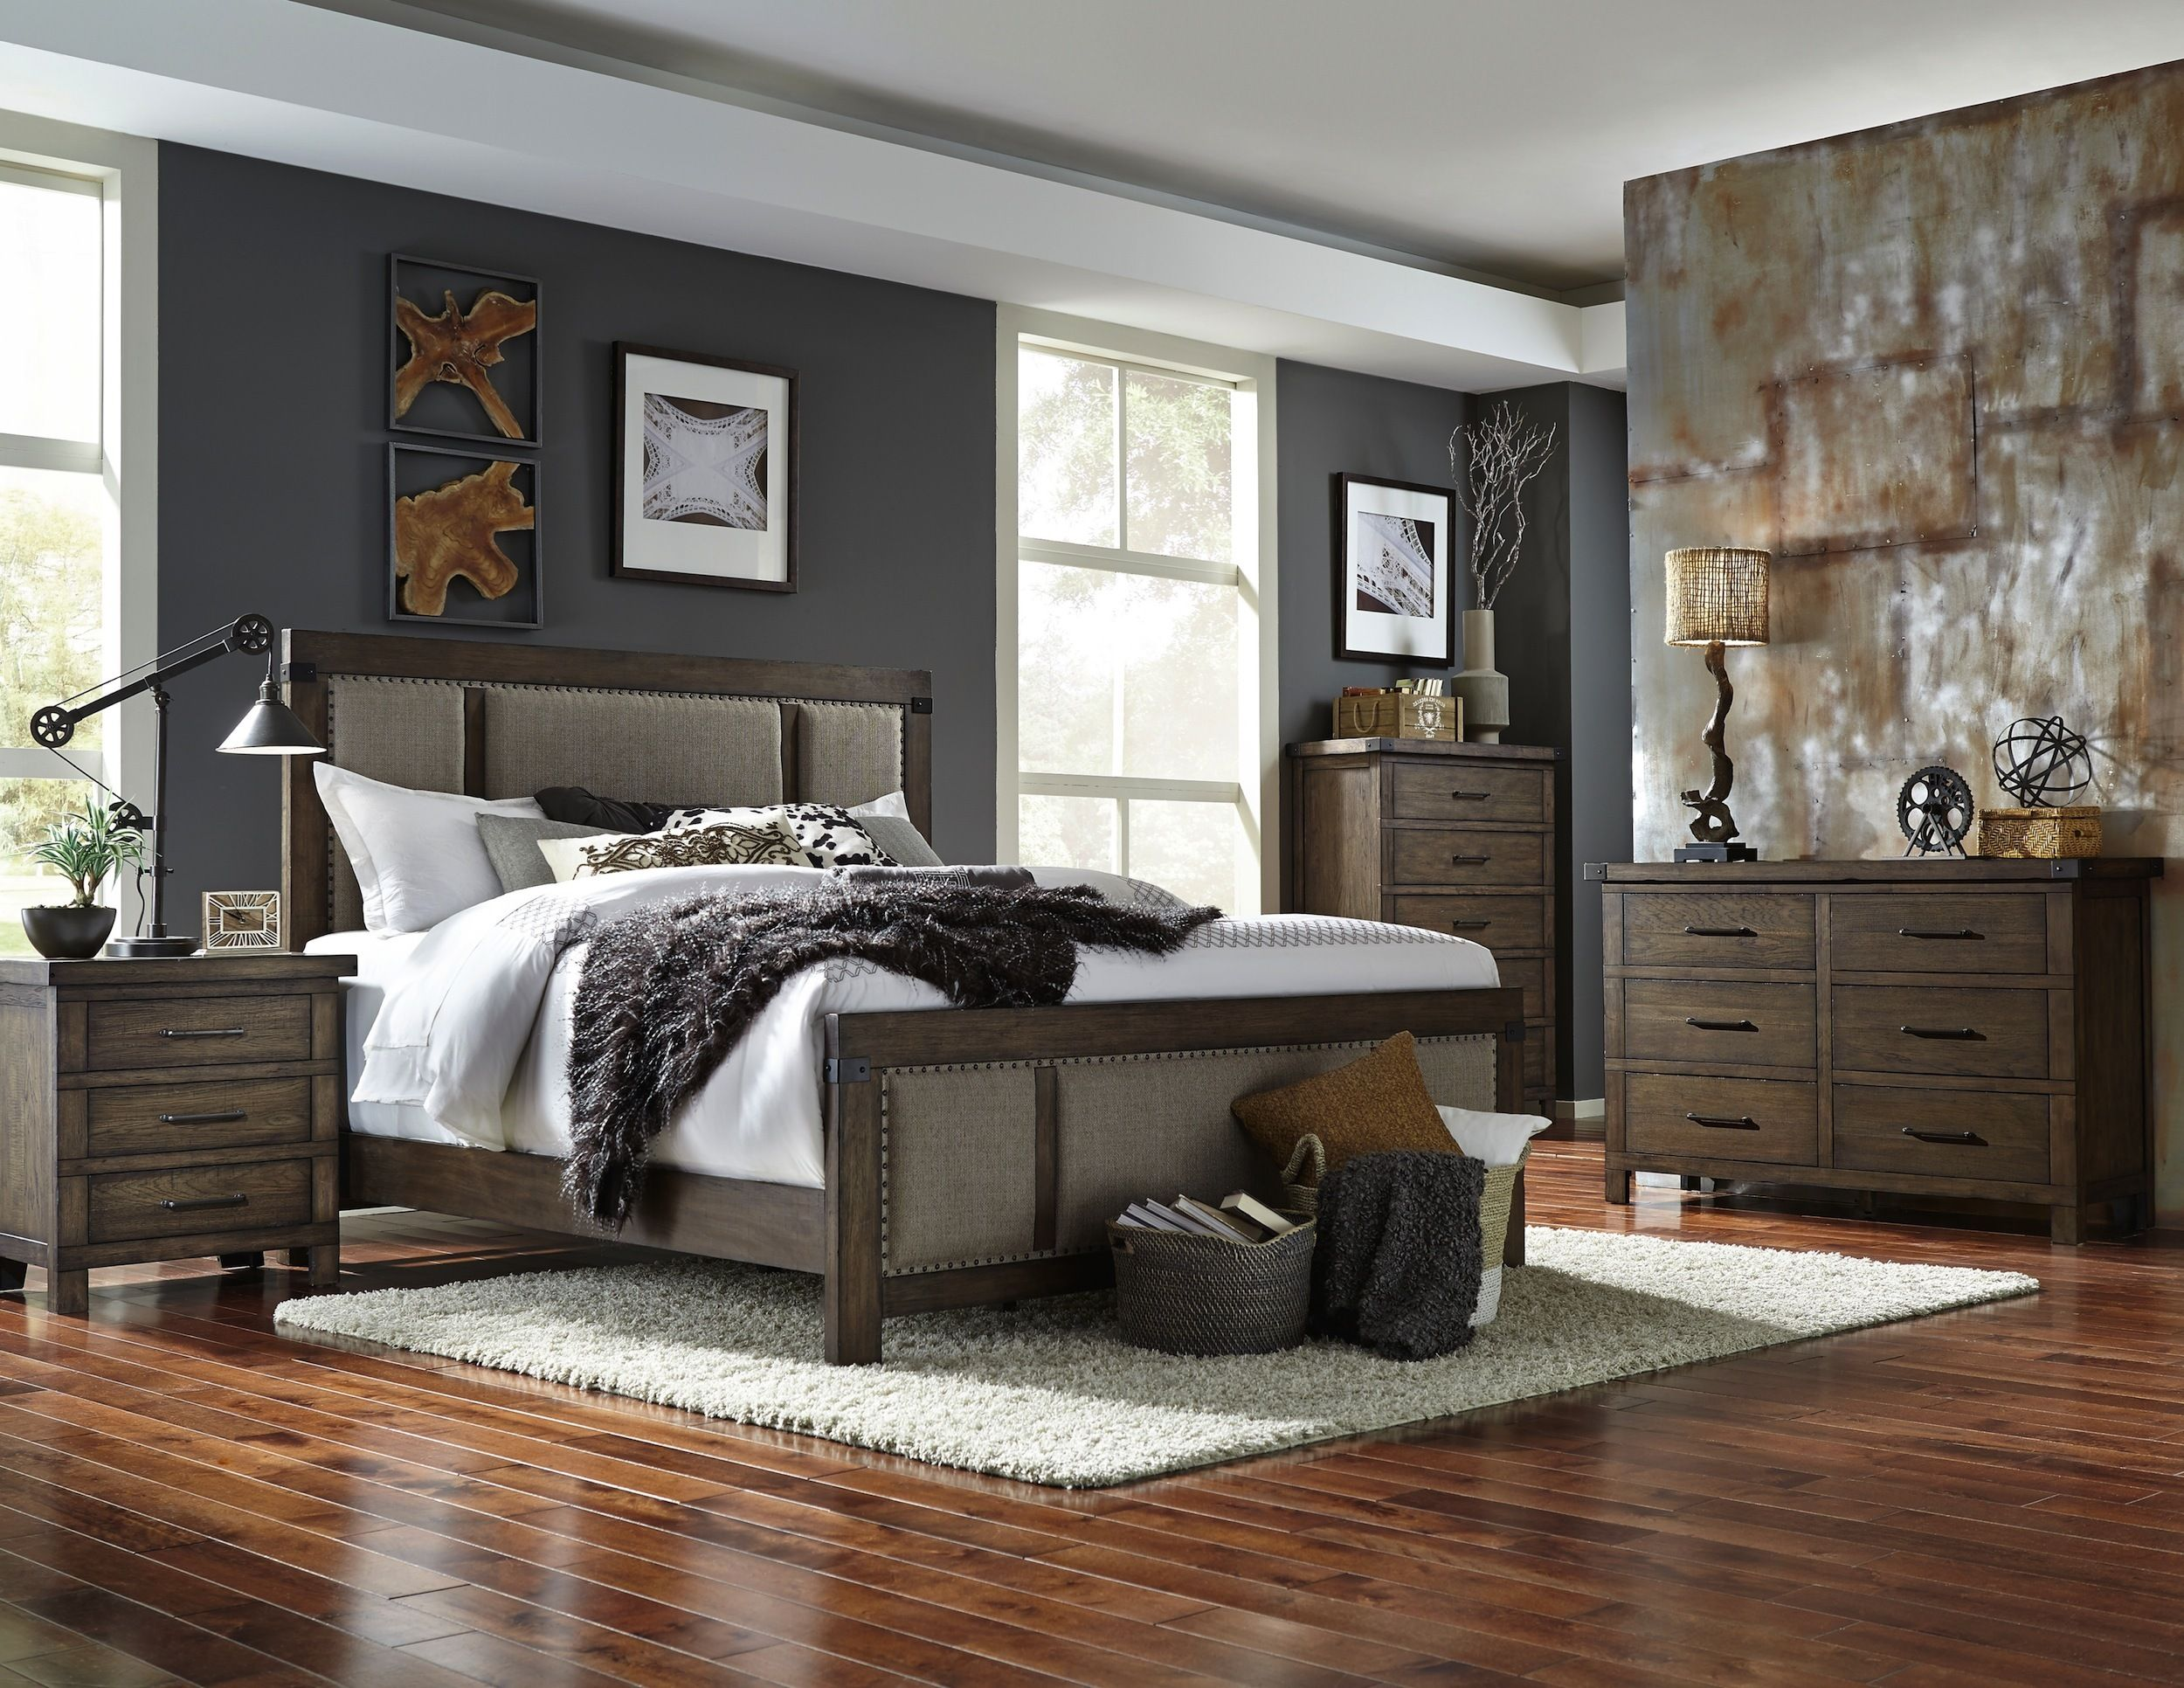 Larimer Square Upholstered Bedroom Set | Broyhill | Home ...